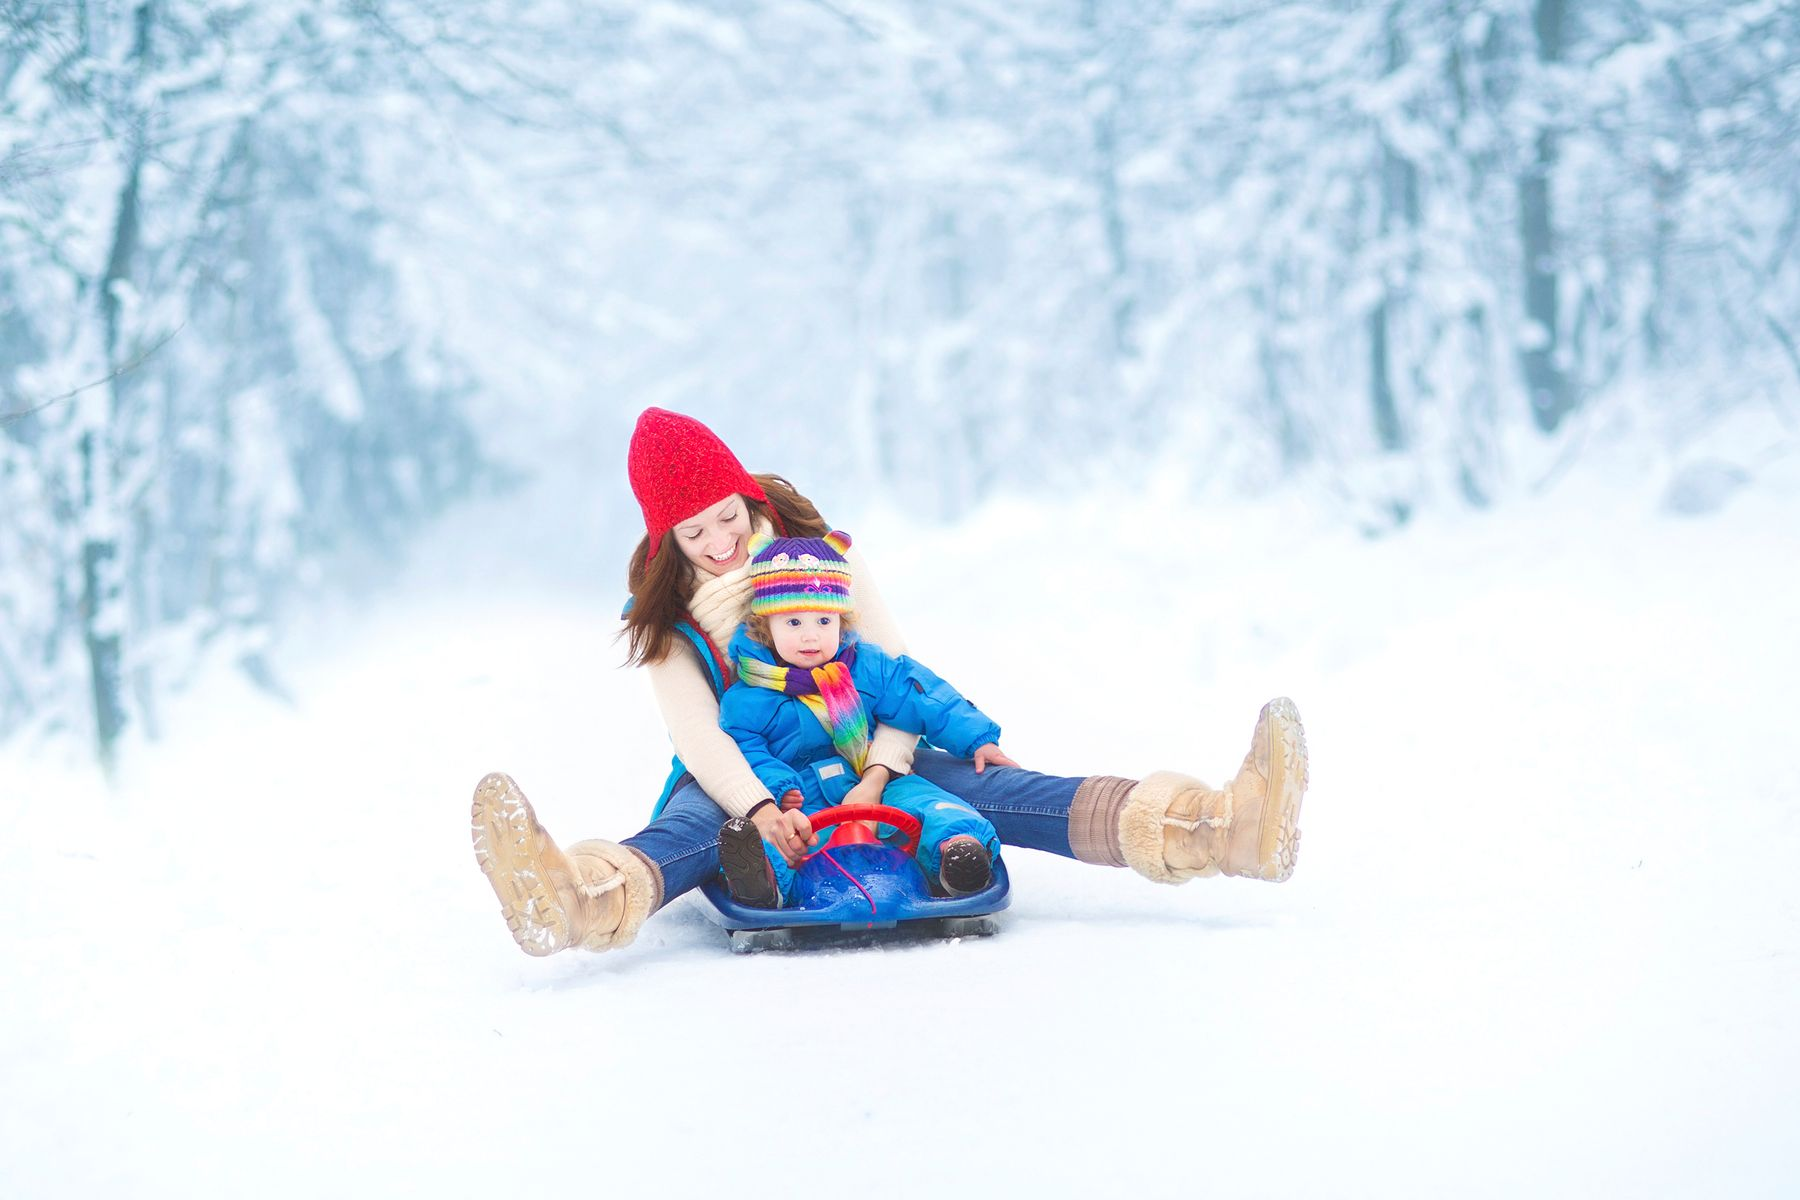 tobogganing in toronto in winter